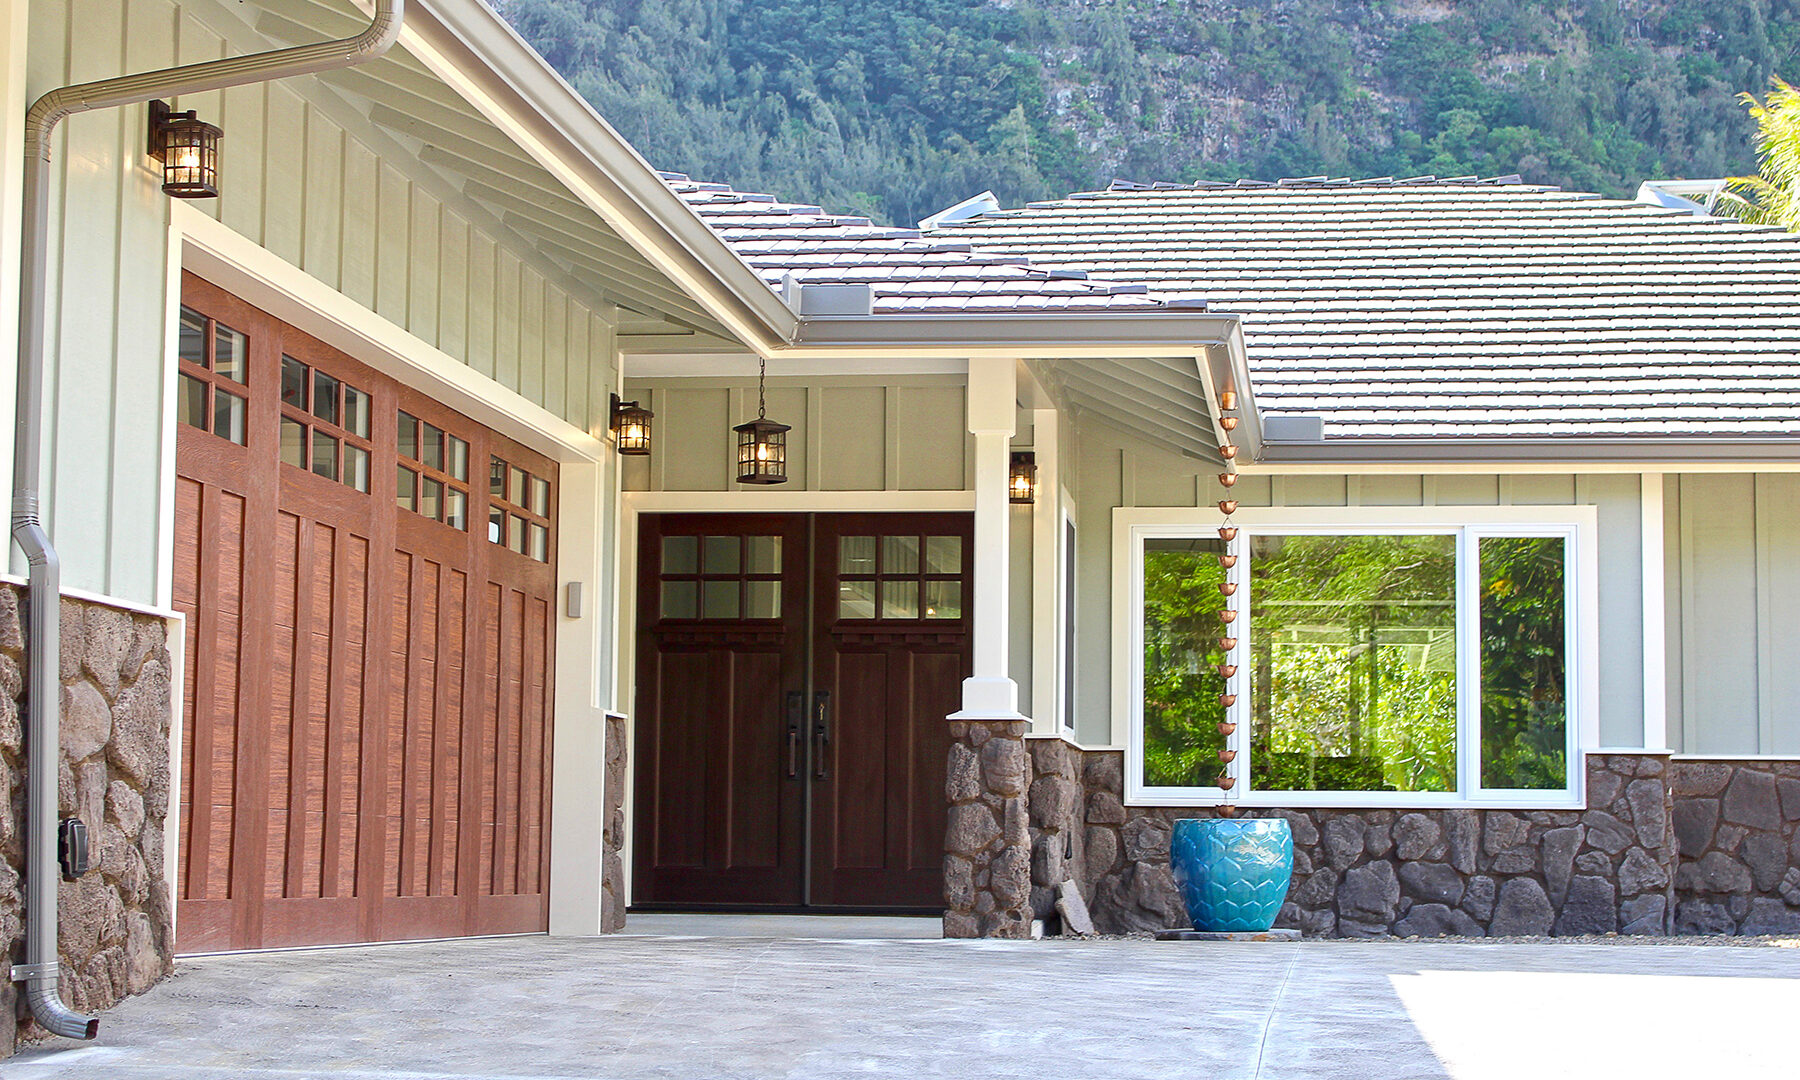 SHB Construction: Steelframe Home Builders Hawaii